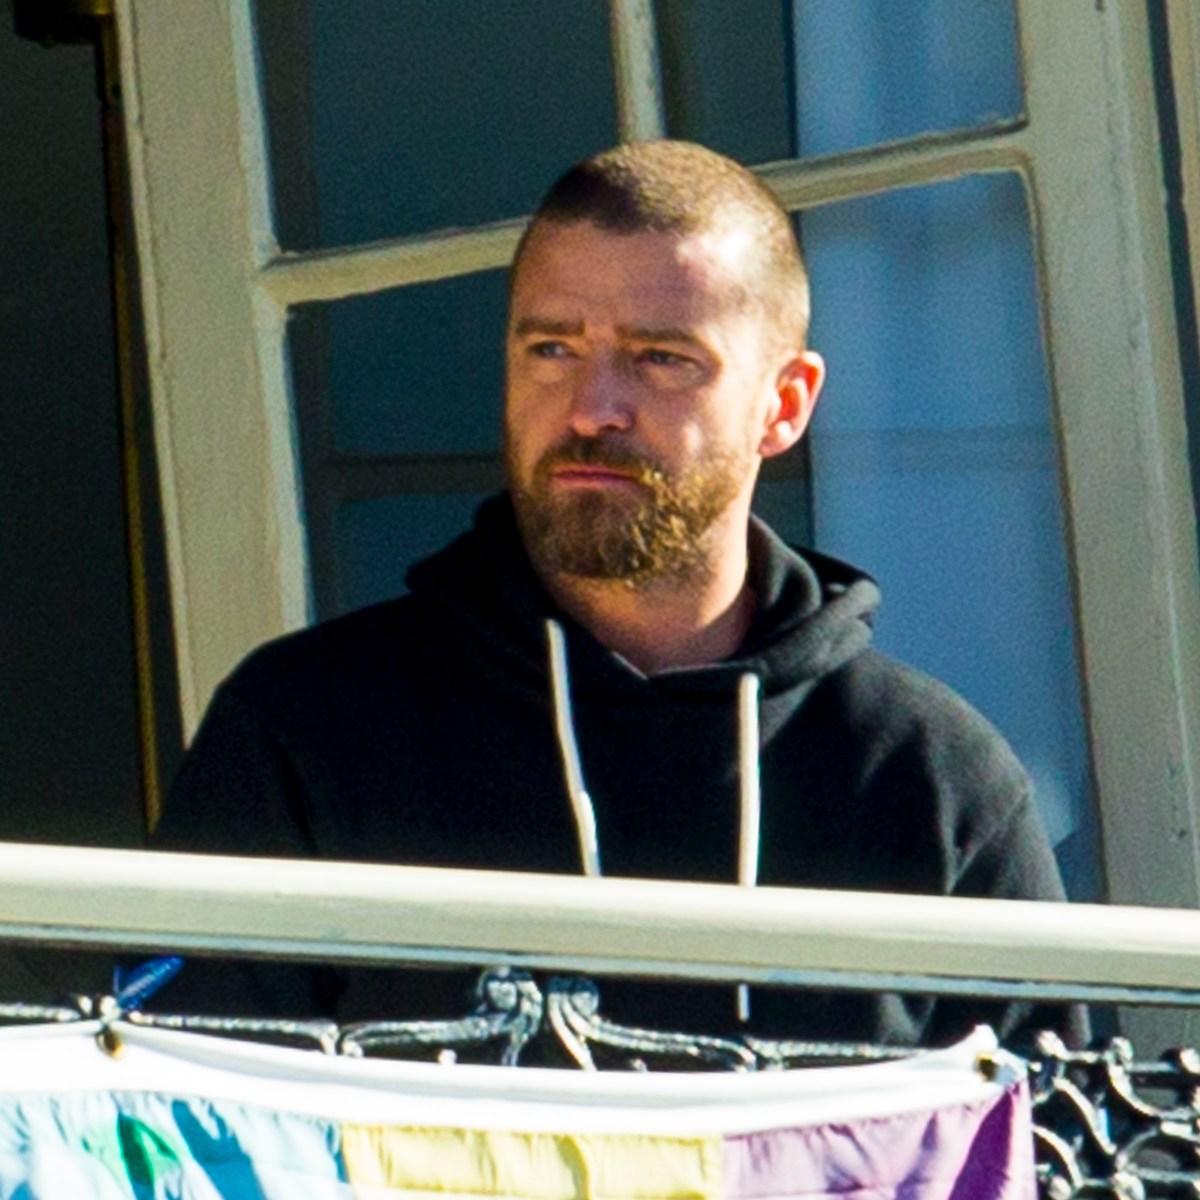 Justin Timberlake Looks Glum on New Orleans Balcony Following Scandal With Alisha Wainwright